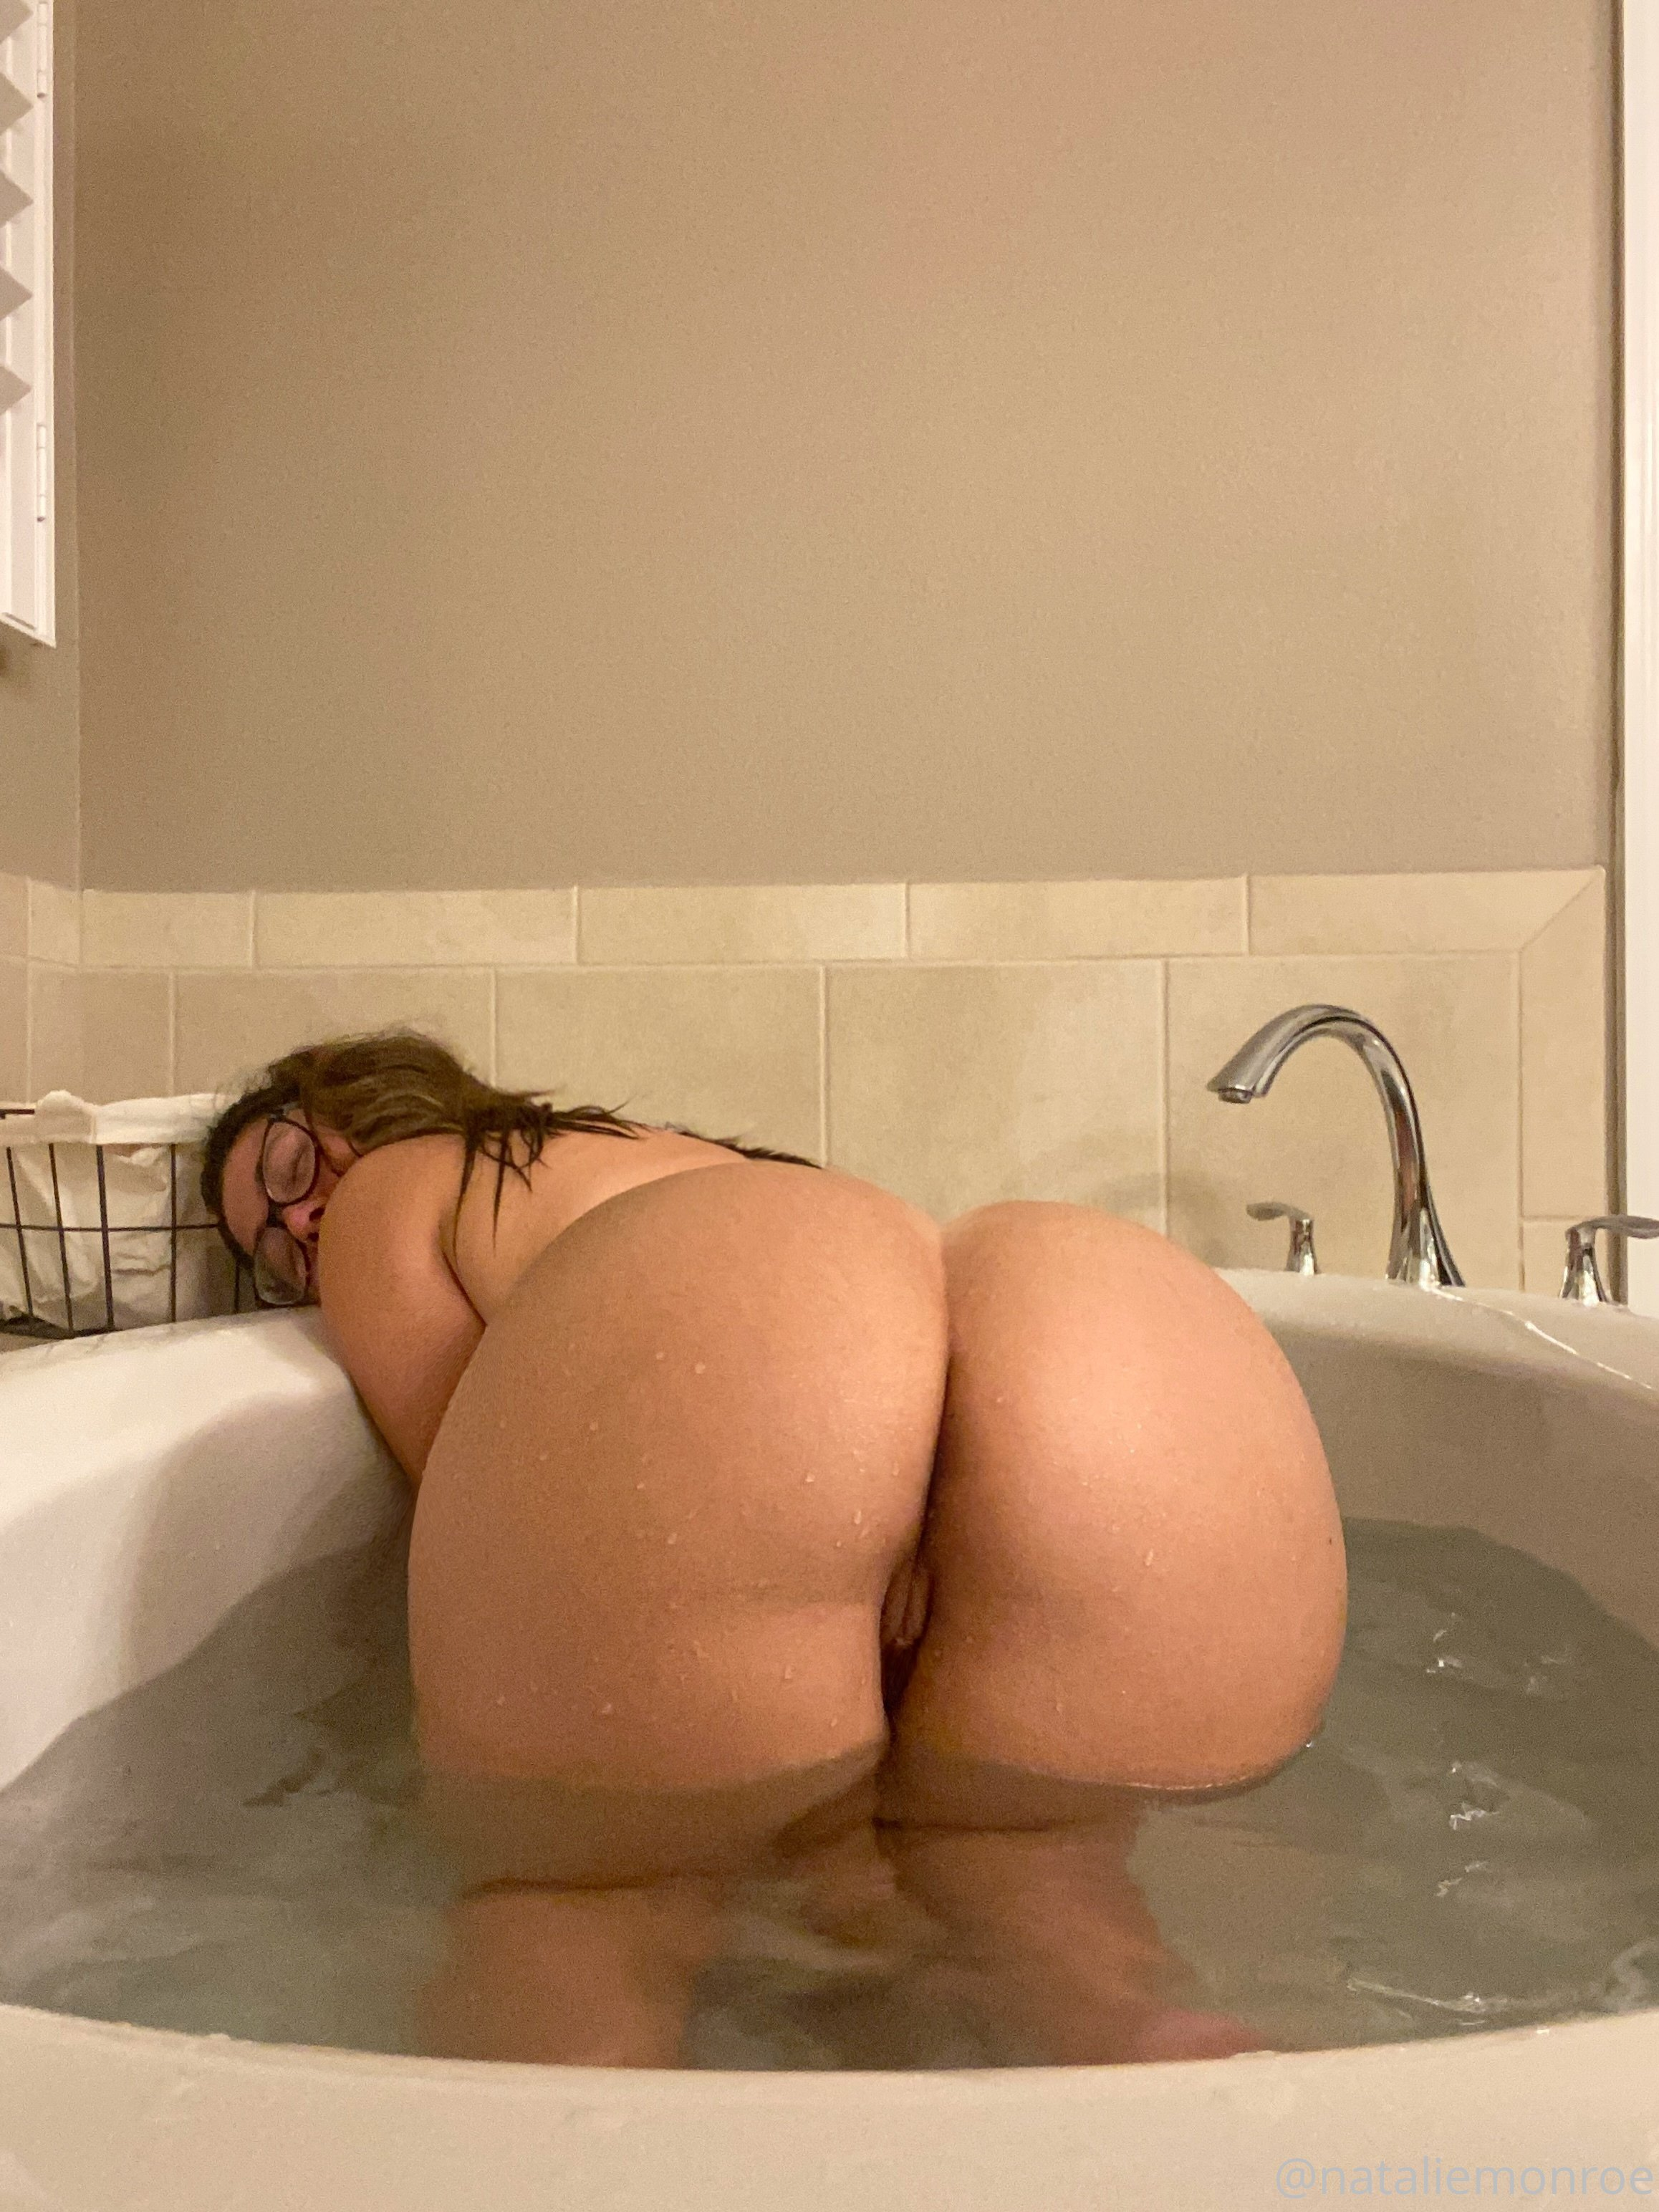 Natalie Monroe, Former Pornstar Now Onlyfans Girl 0003